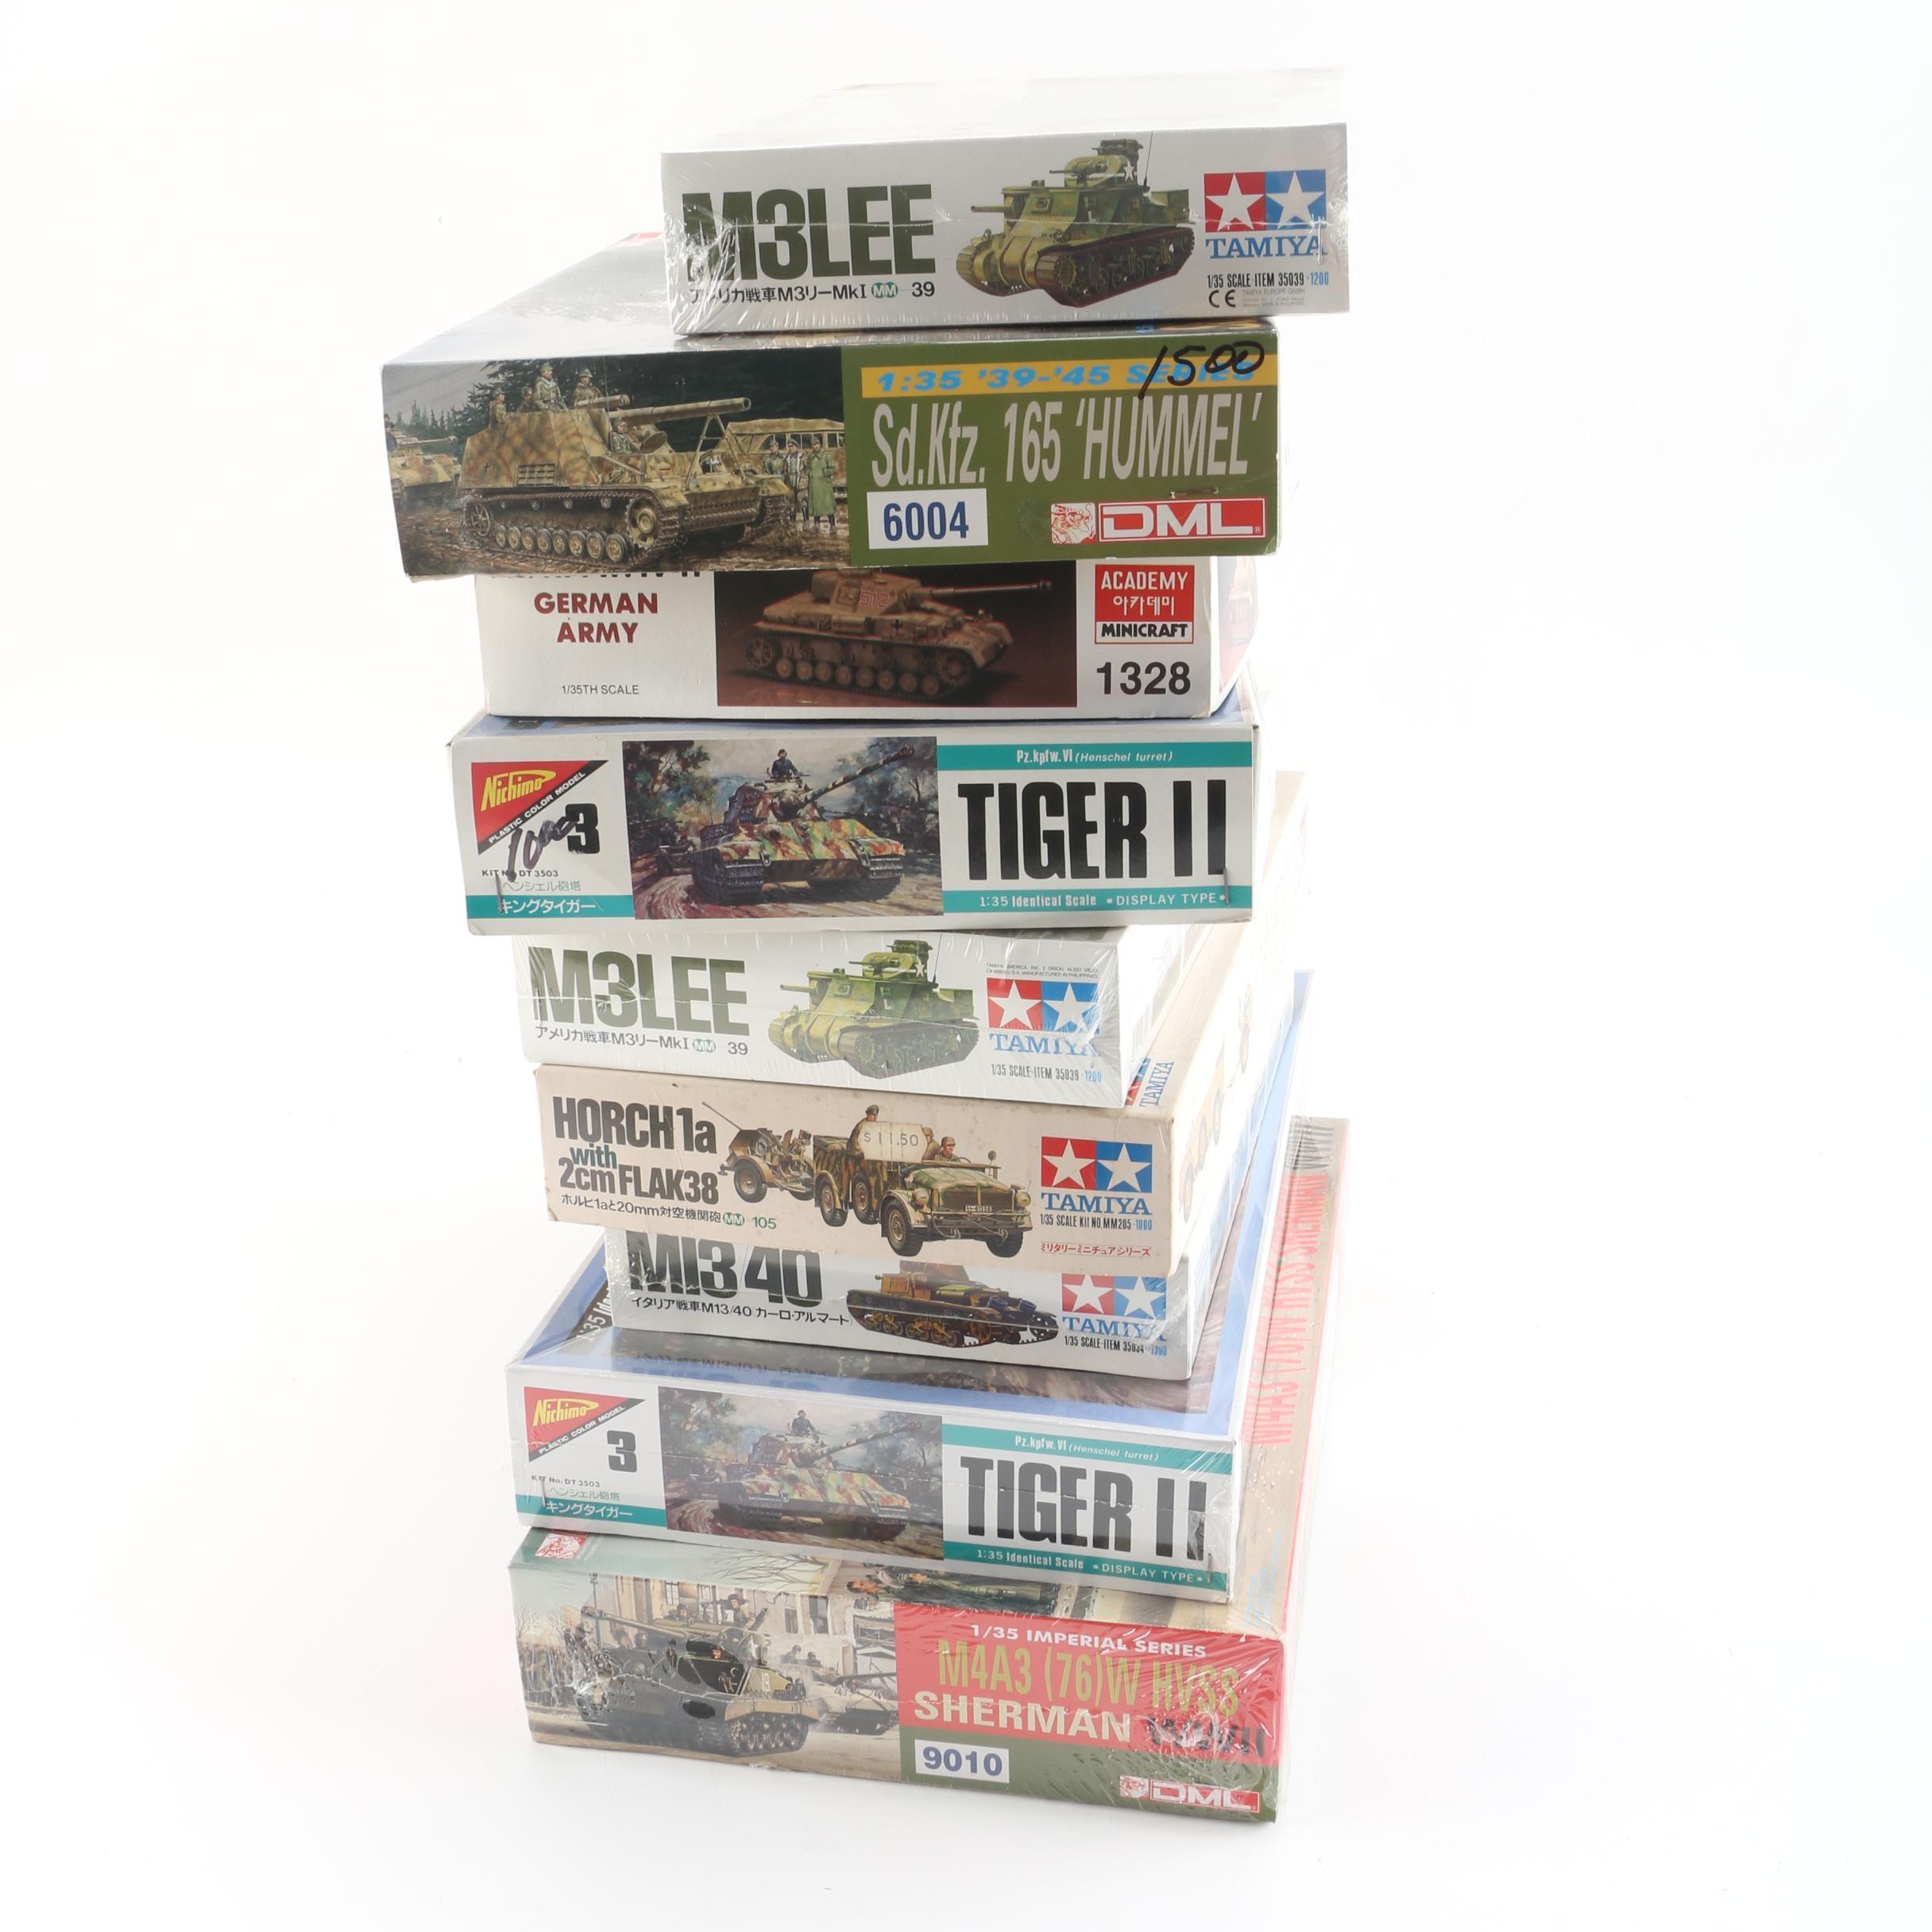 Vintage Tamiya and Other Miliatry Vehicle Model Kits